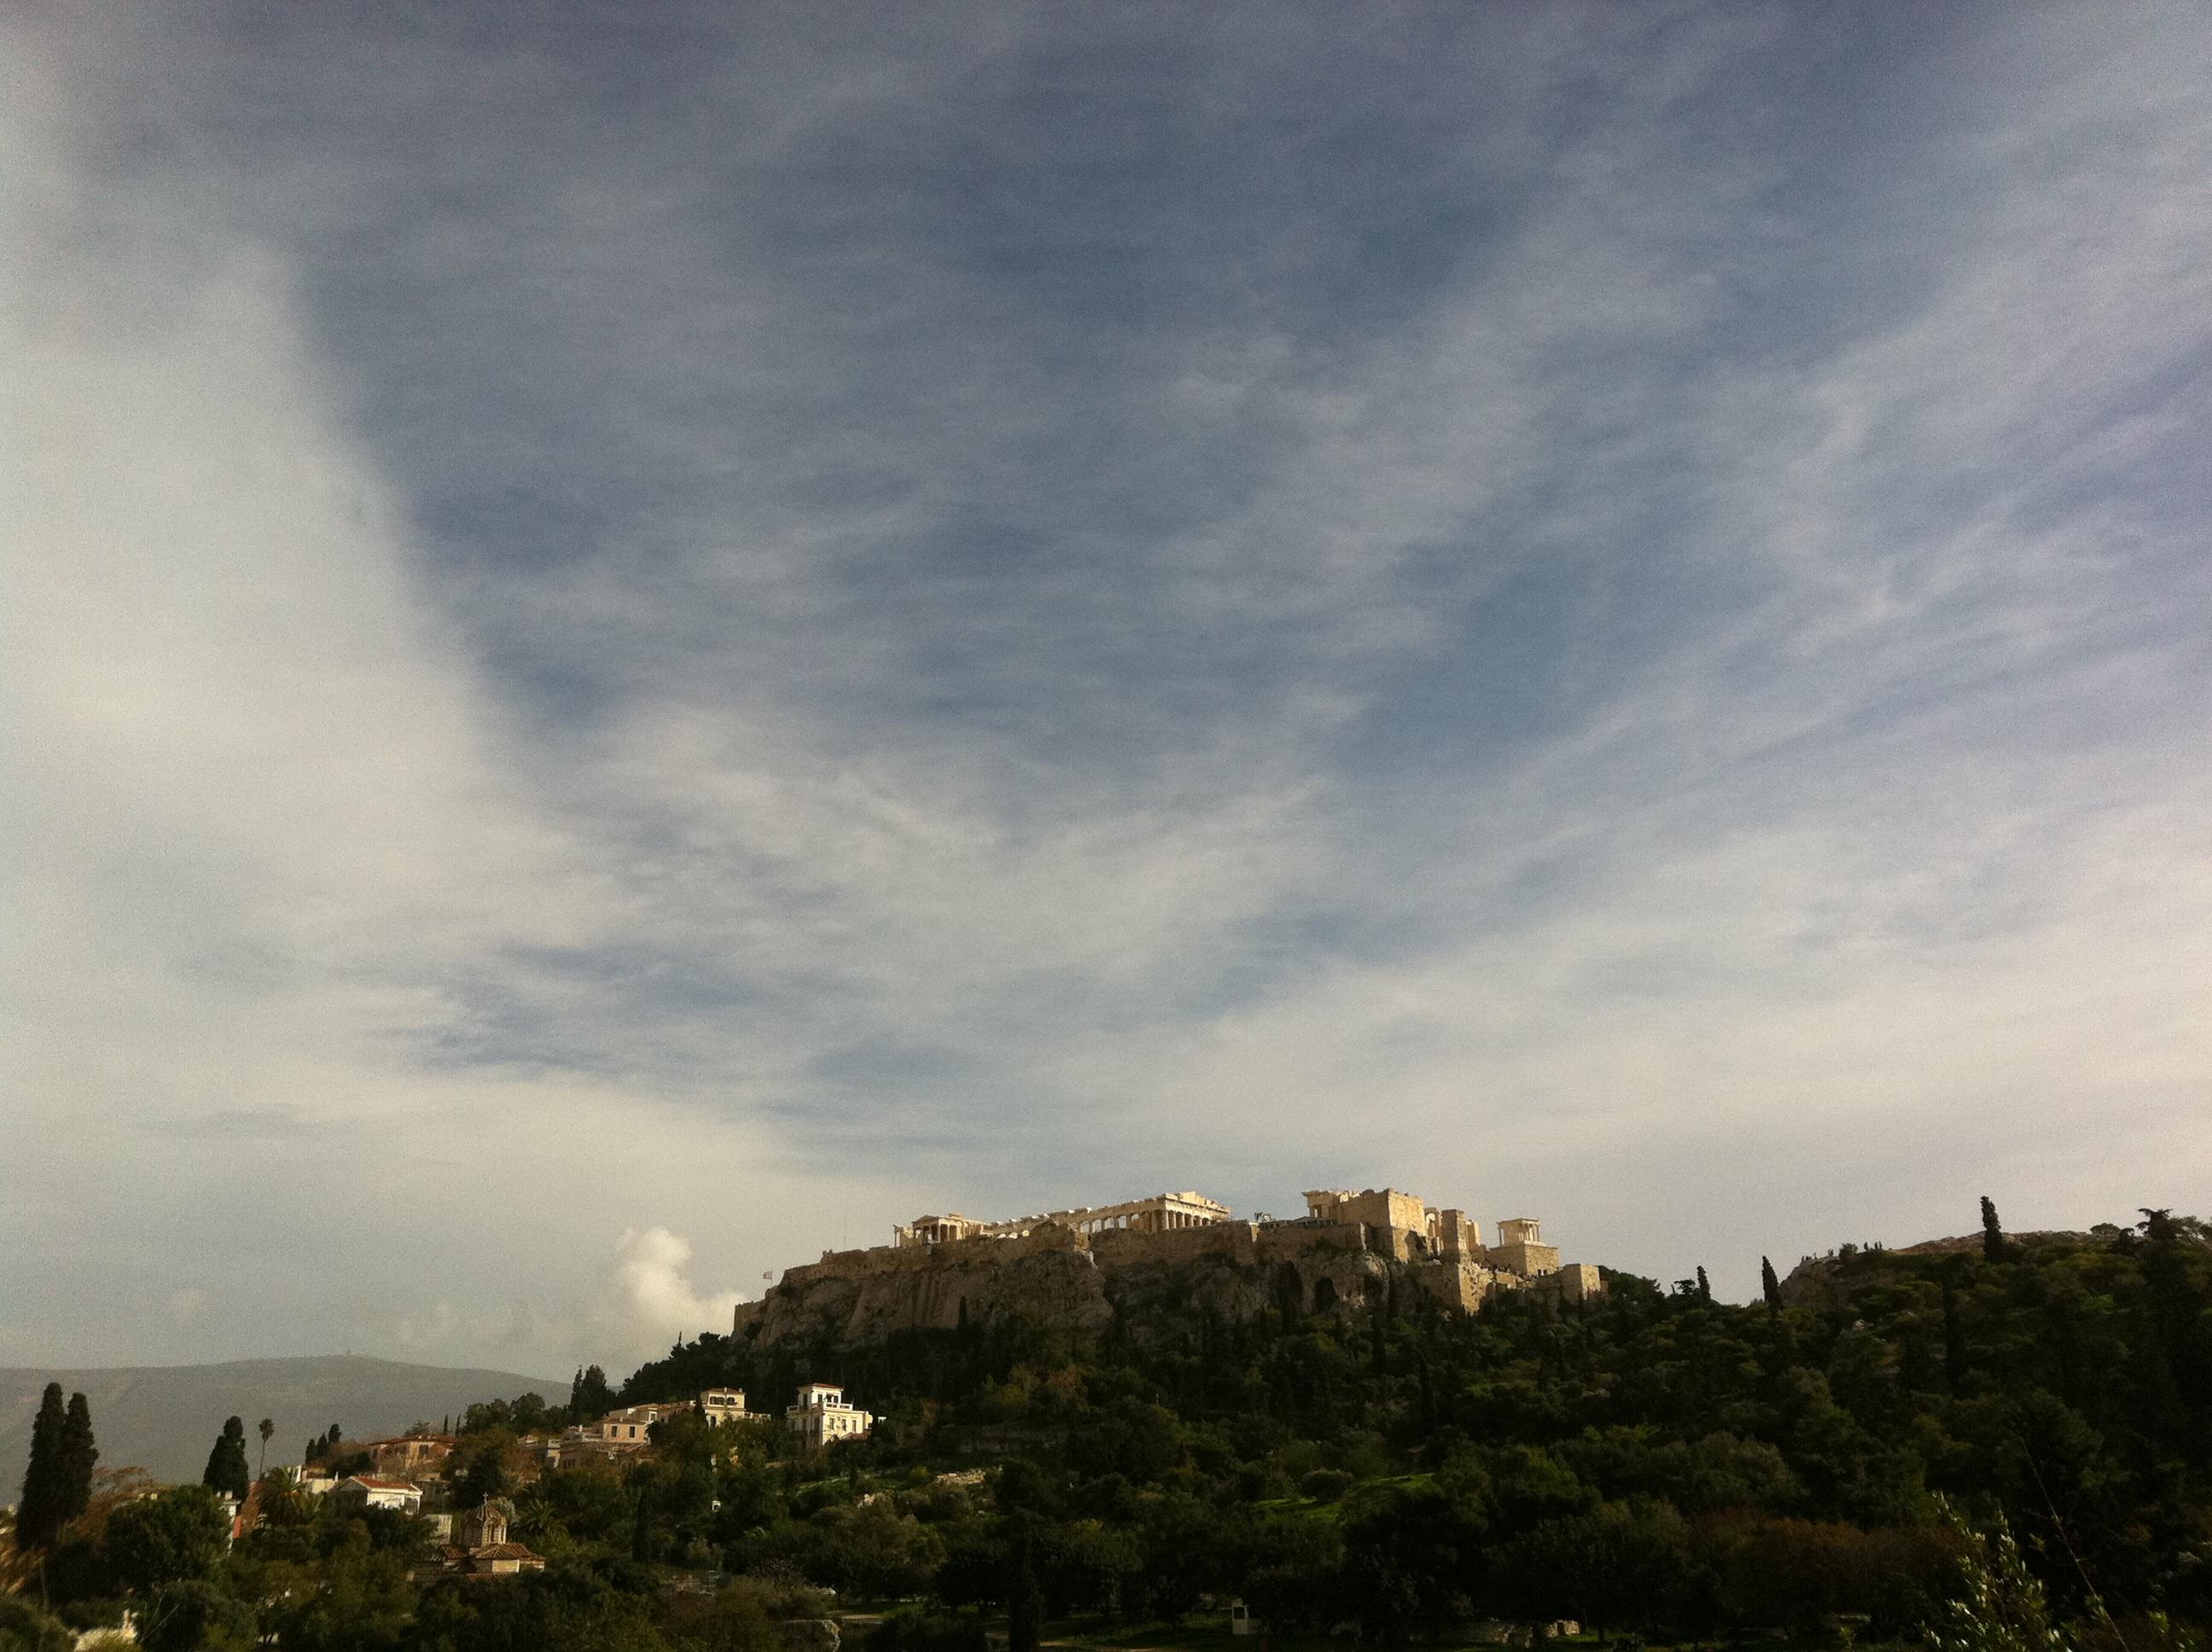 The Acropolis, from The Agora